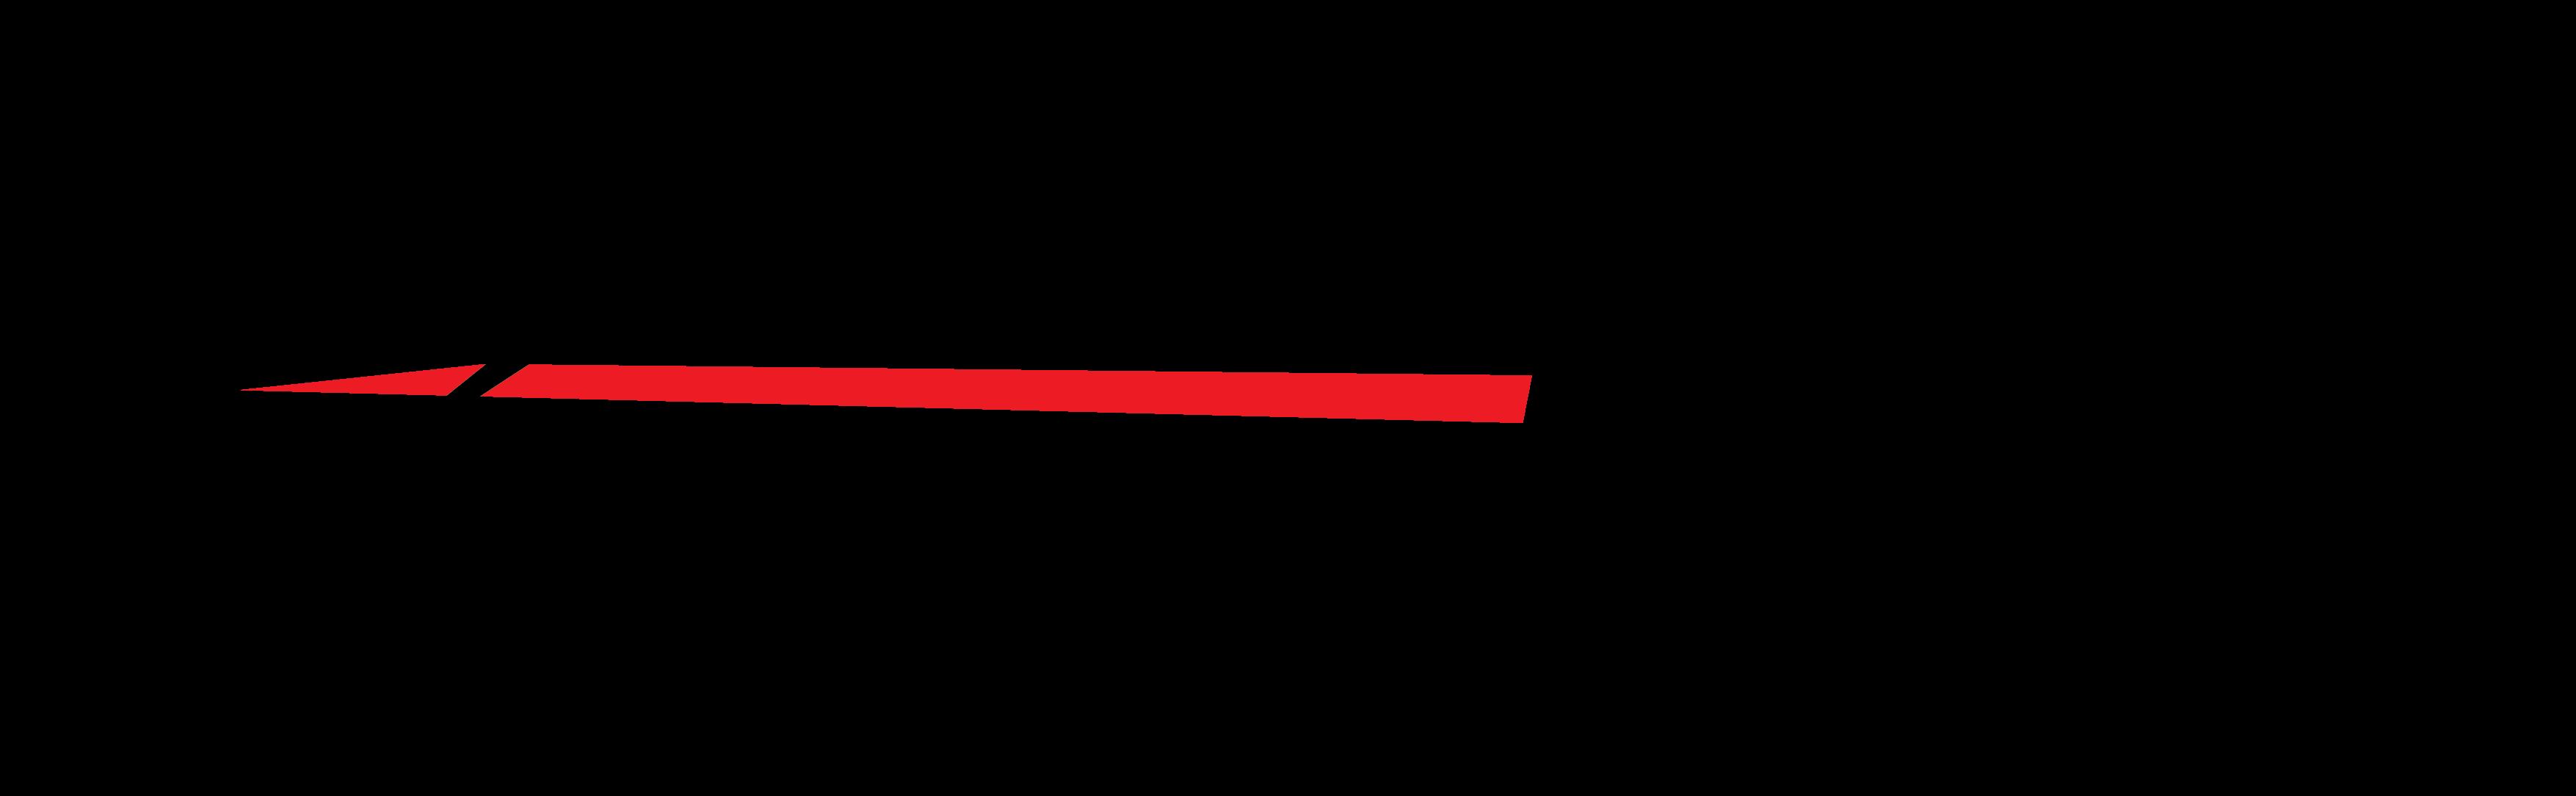 Autopflege- und Lackierbetrieb Roick